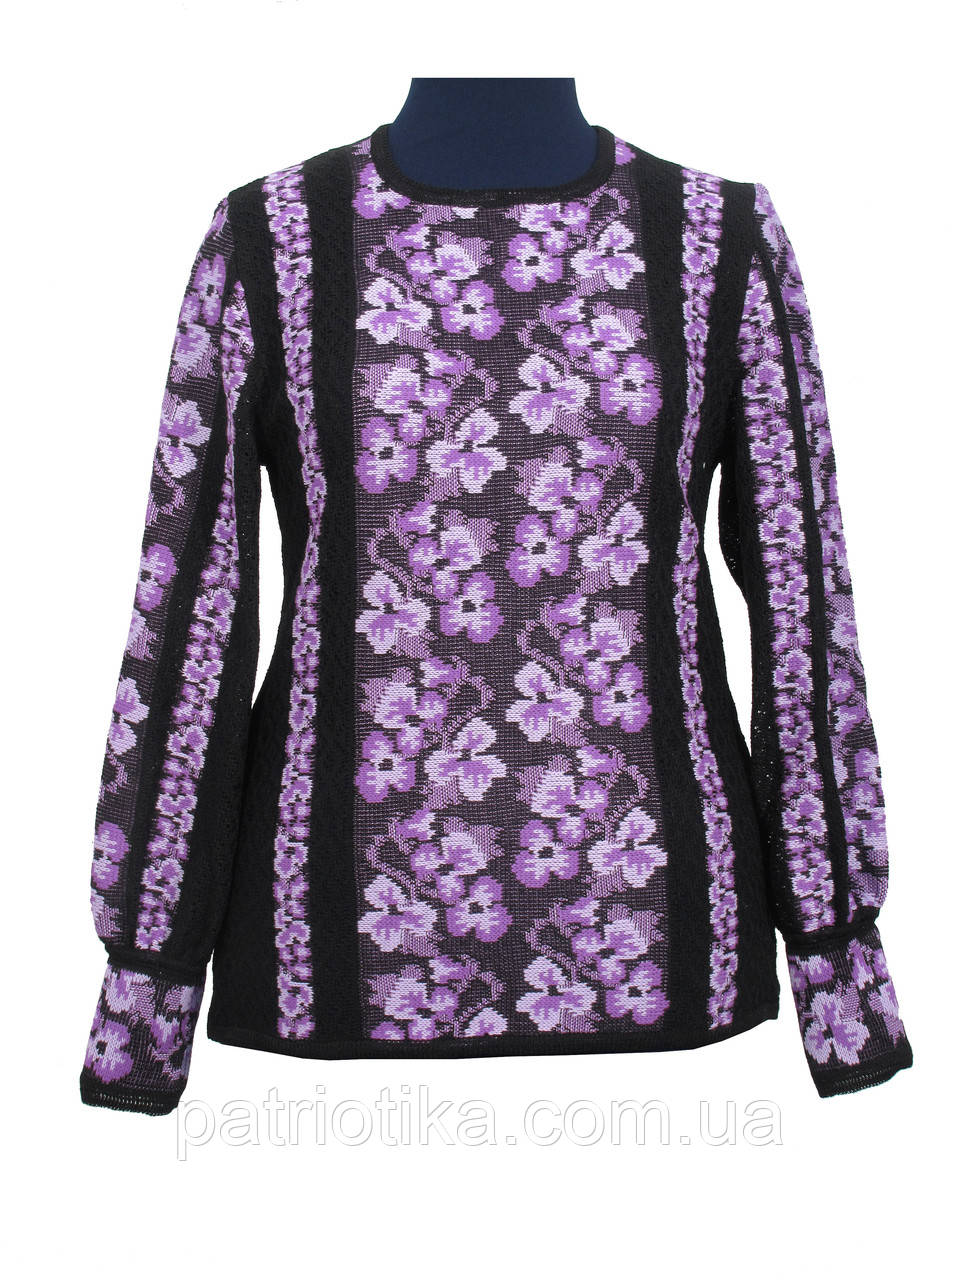 Женская вязанка Братцы фиолетовые х/б | Жіноча в'язанка Братики фіолетові х/б